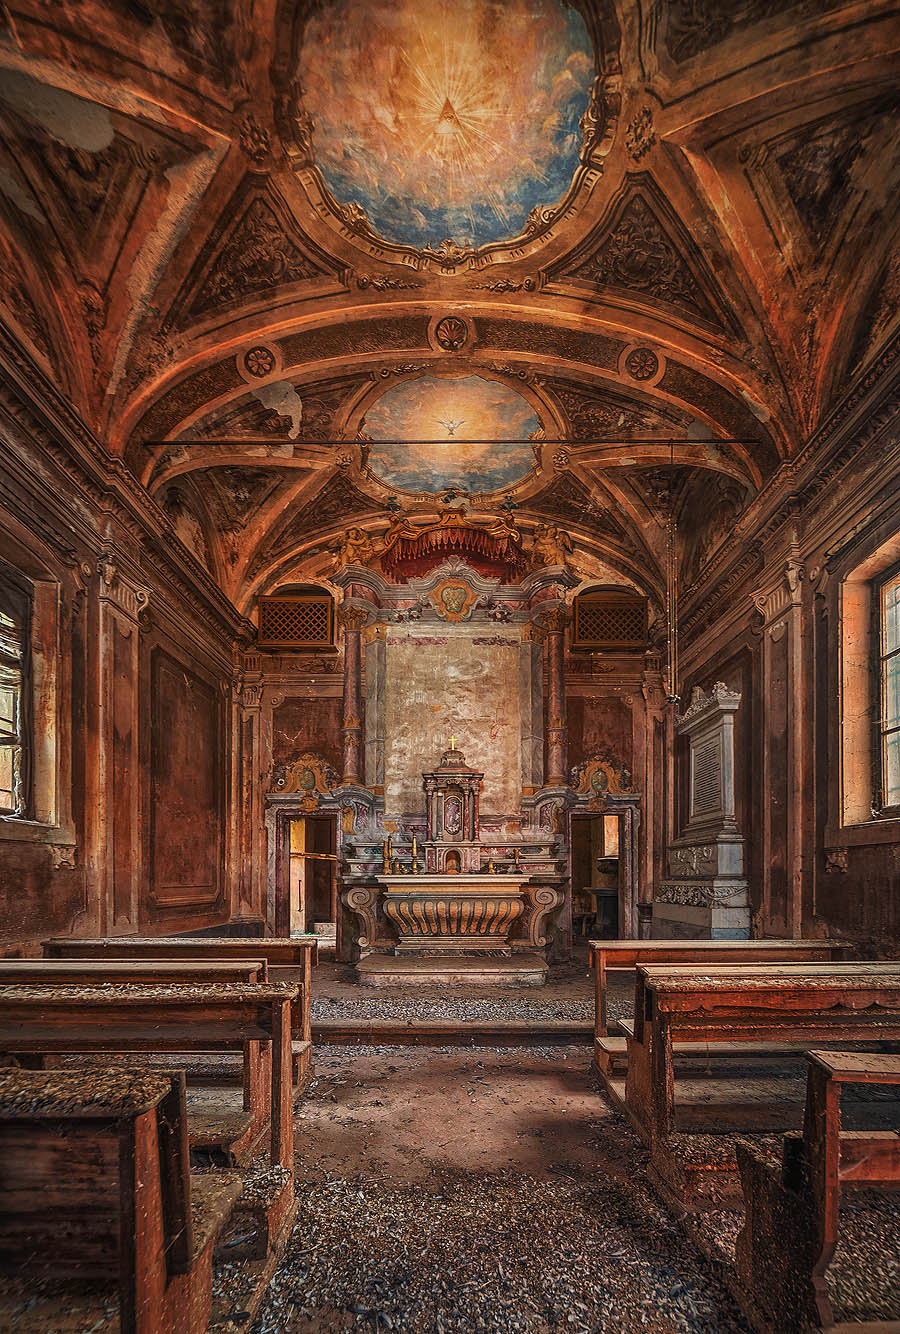 Abandoned Places of Worship